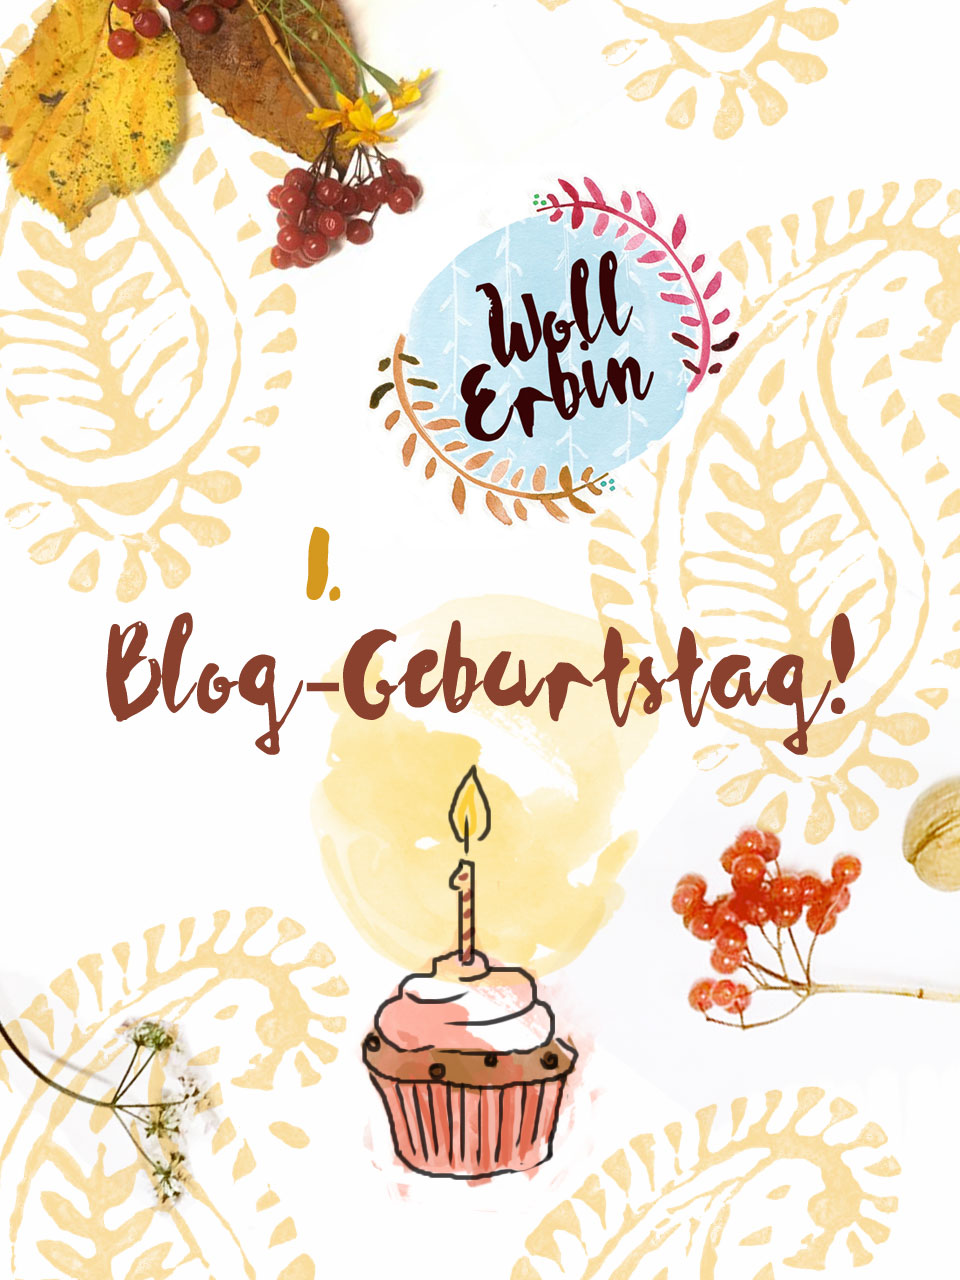 Happy-Bloggeburtstag